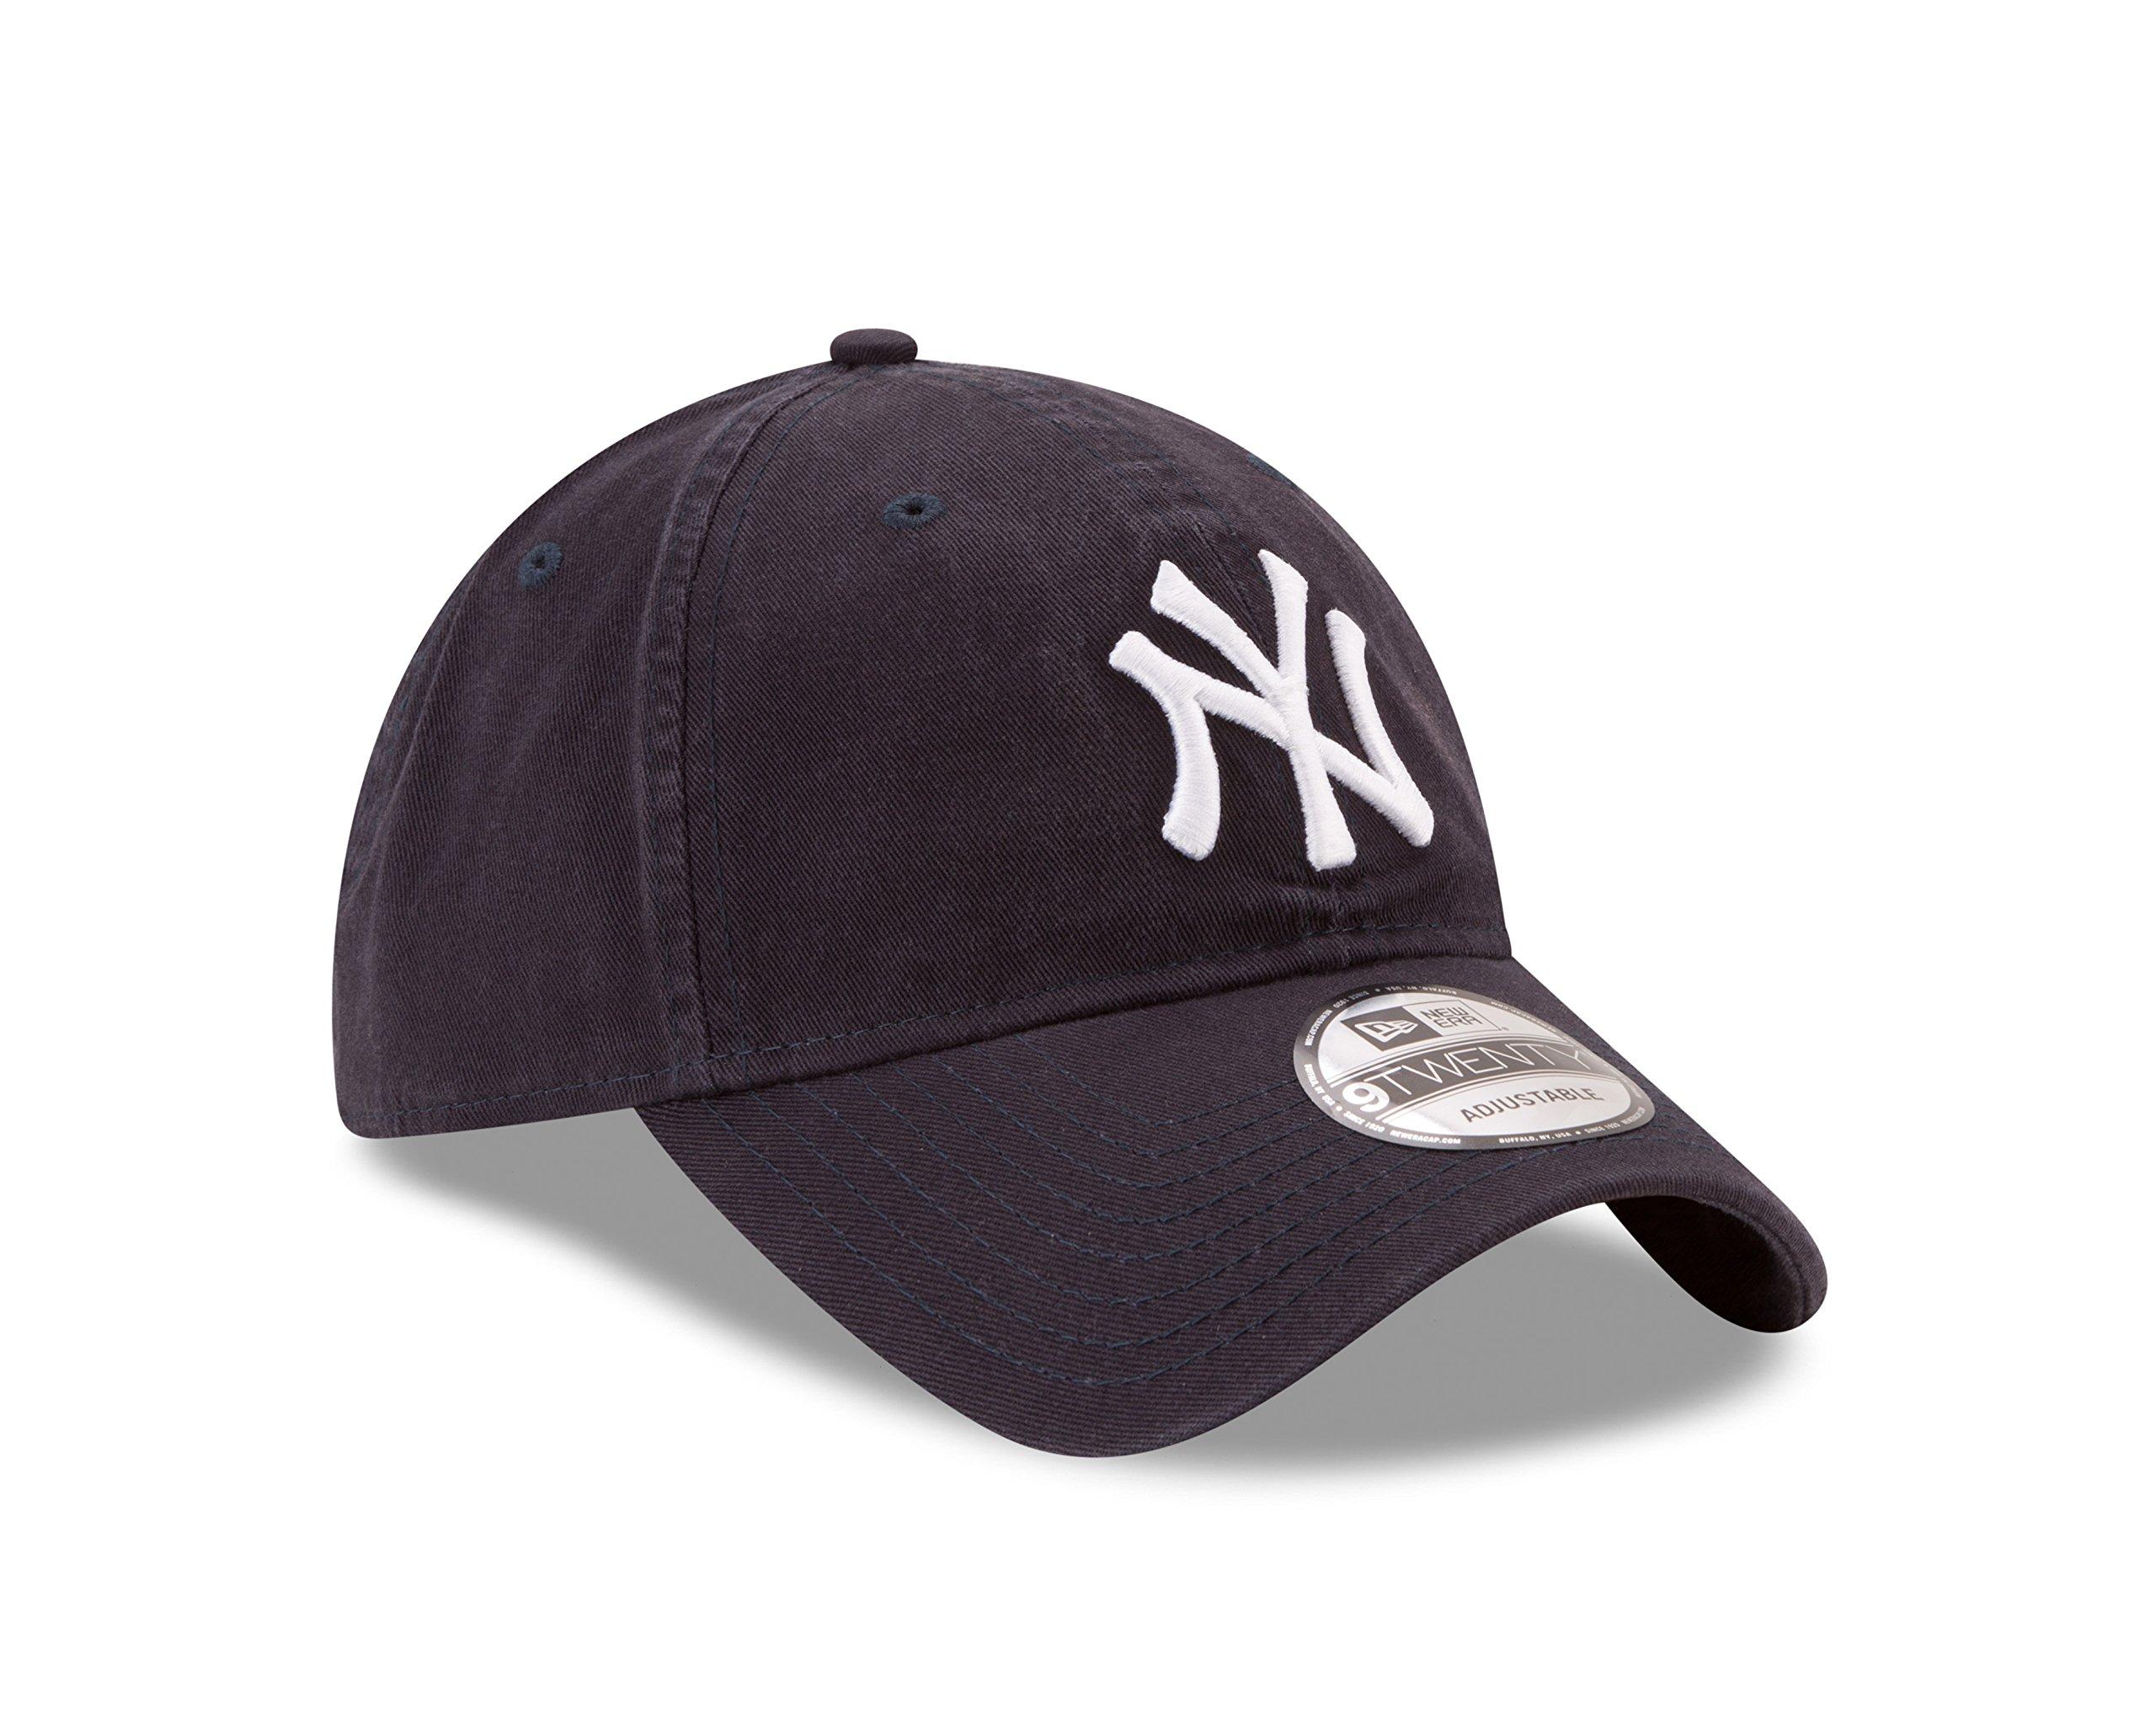 New Era New York Yankees MLB Core Classic 9TWENTY Adjustable Cap Navy by New Era (Image #2)